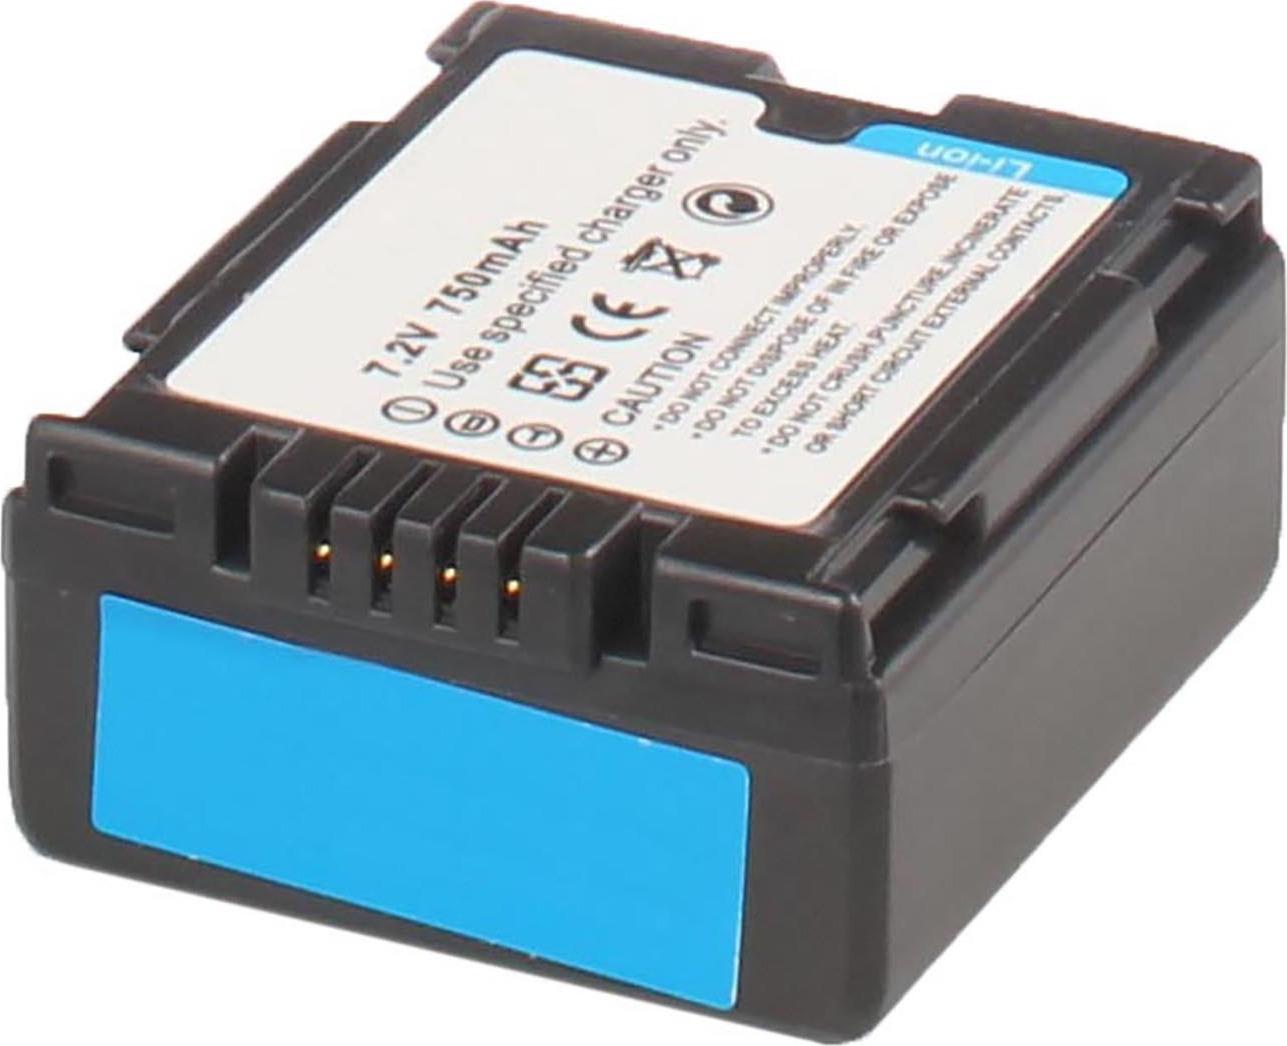 Аккумуляторная батарея iBatt iB-T1-F312 750mAh для камер Hitachi DZ-MV350E, DZ-MV730E, DZ-BD70, DZ-GX3100E, DZ-MV380, DZ-BD7H, DZ-MV750E,  для Panasonic NV-GS27, NV-GS300, NV-GS400, NV-GS500, NV-GS35, SDR-H280, NV-GS6, SDR-H20, NV-GS230, NV-GS180,